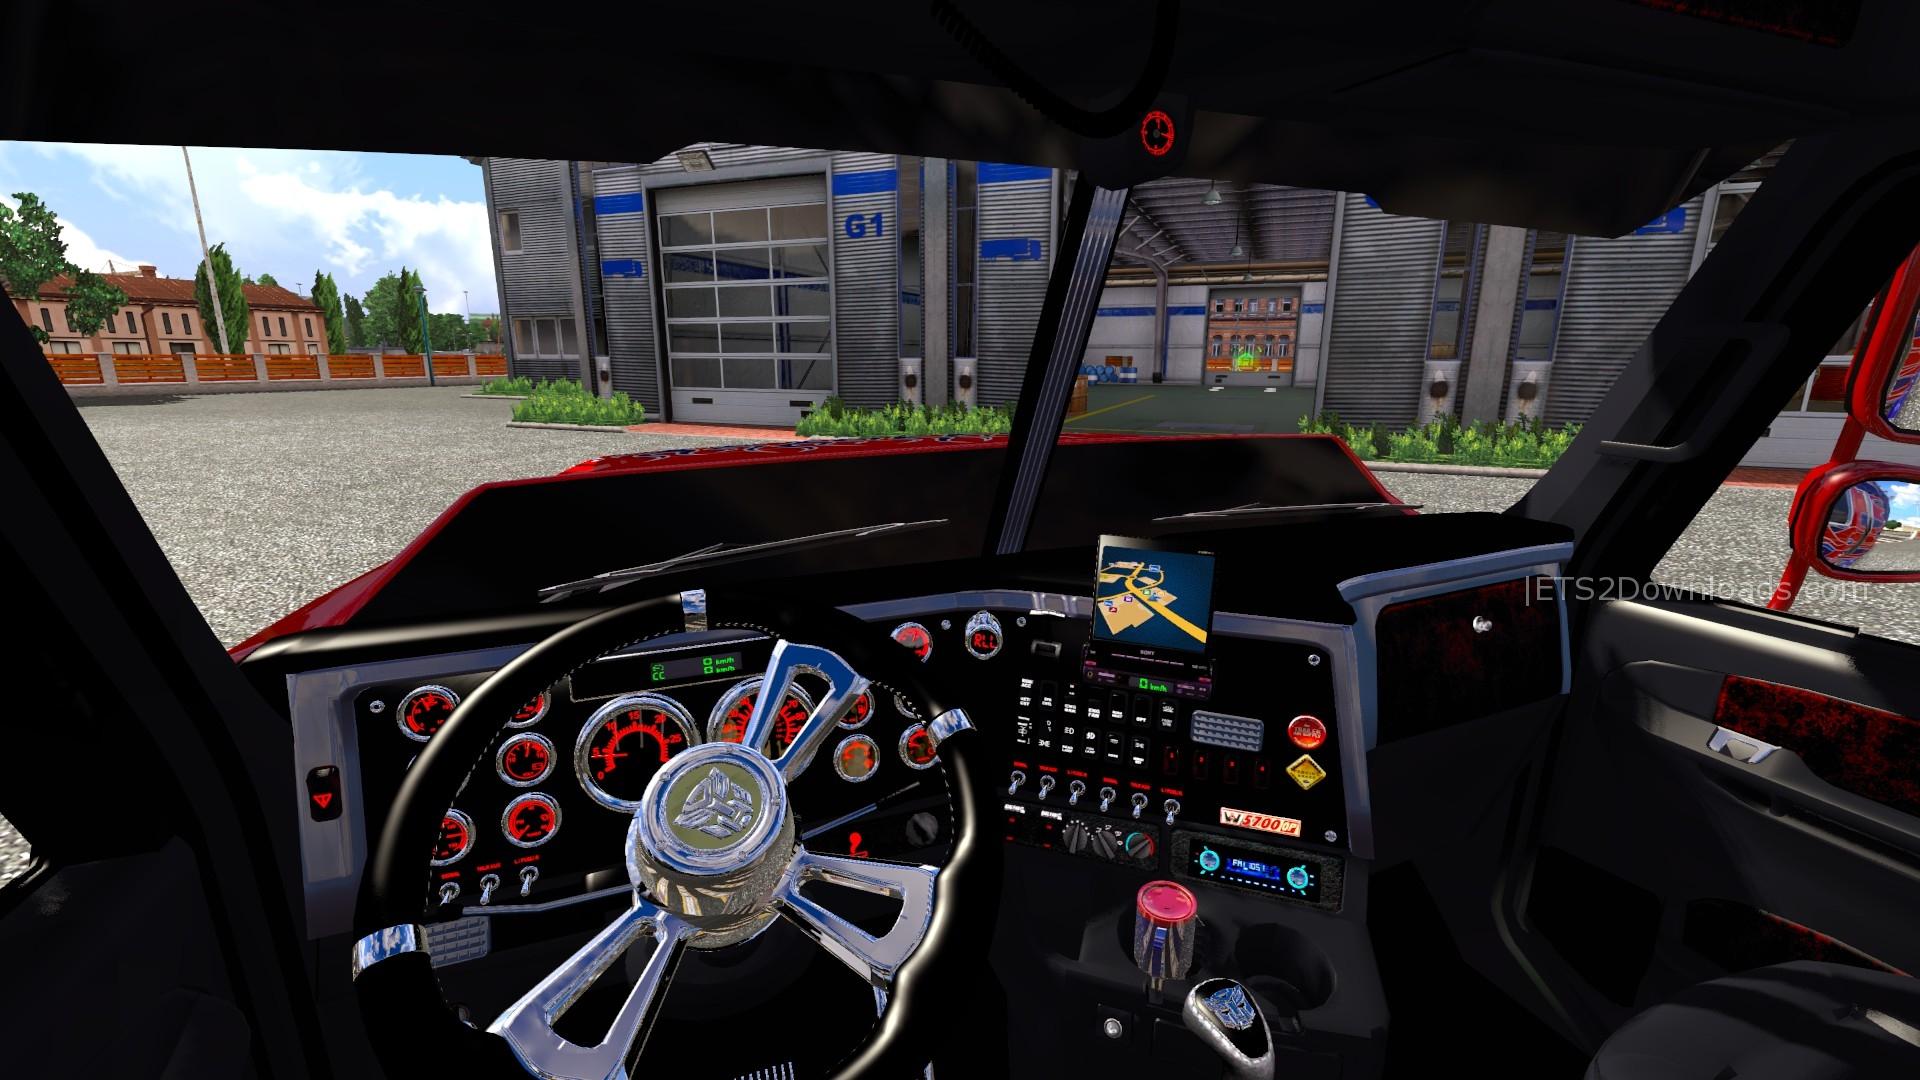 optimus-prime-truck-transformer-4-6